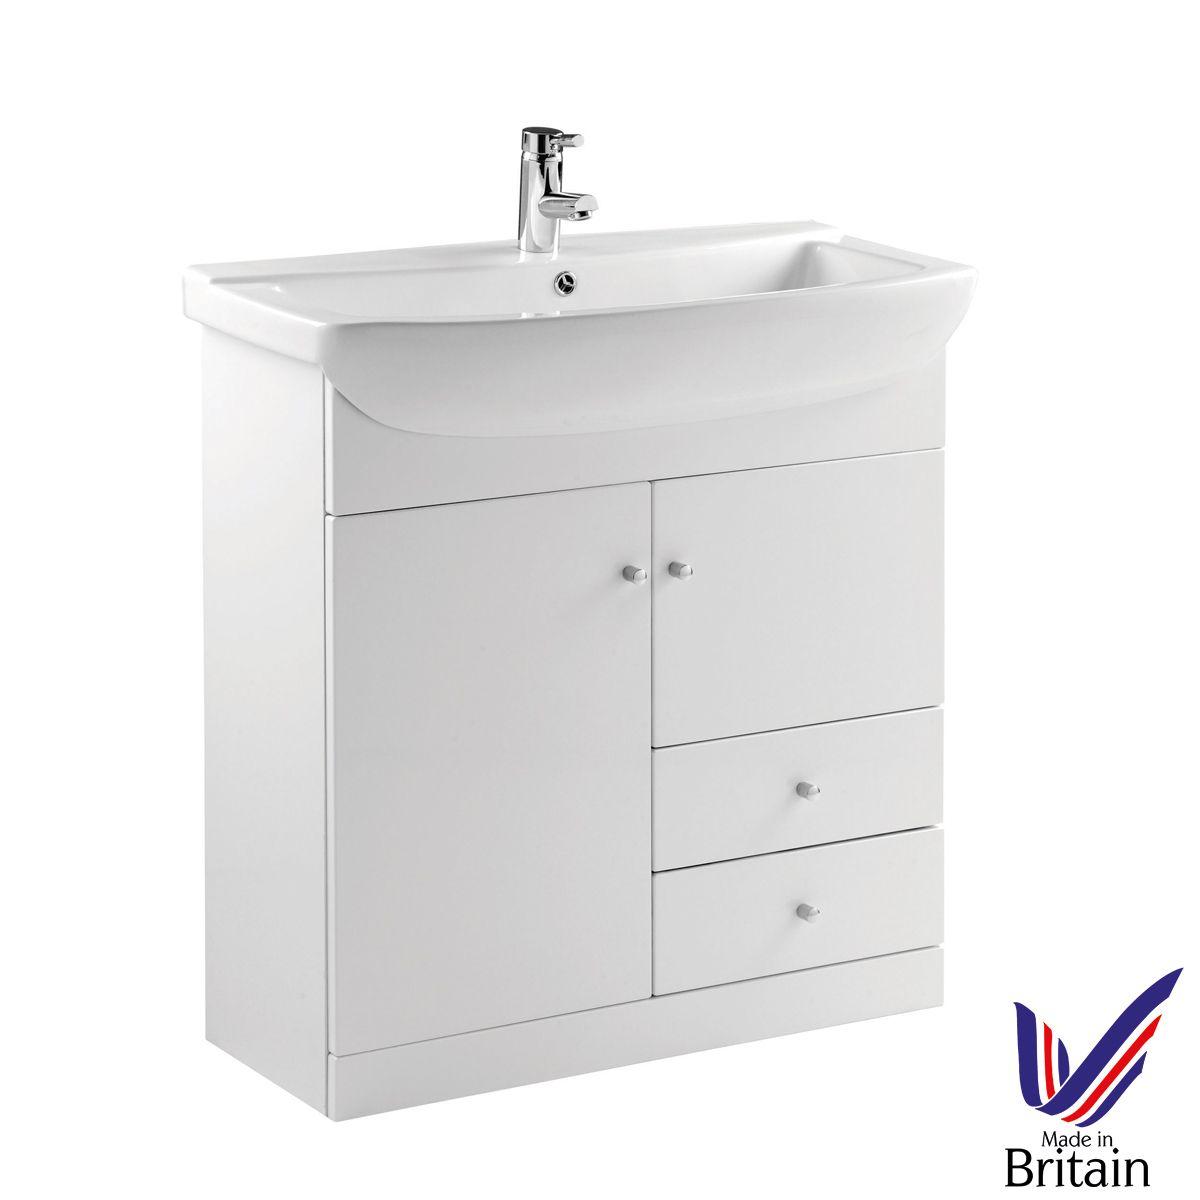 Ikoma White Gloss Vanity Unit with Basin 850mm